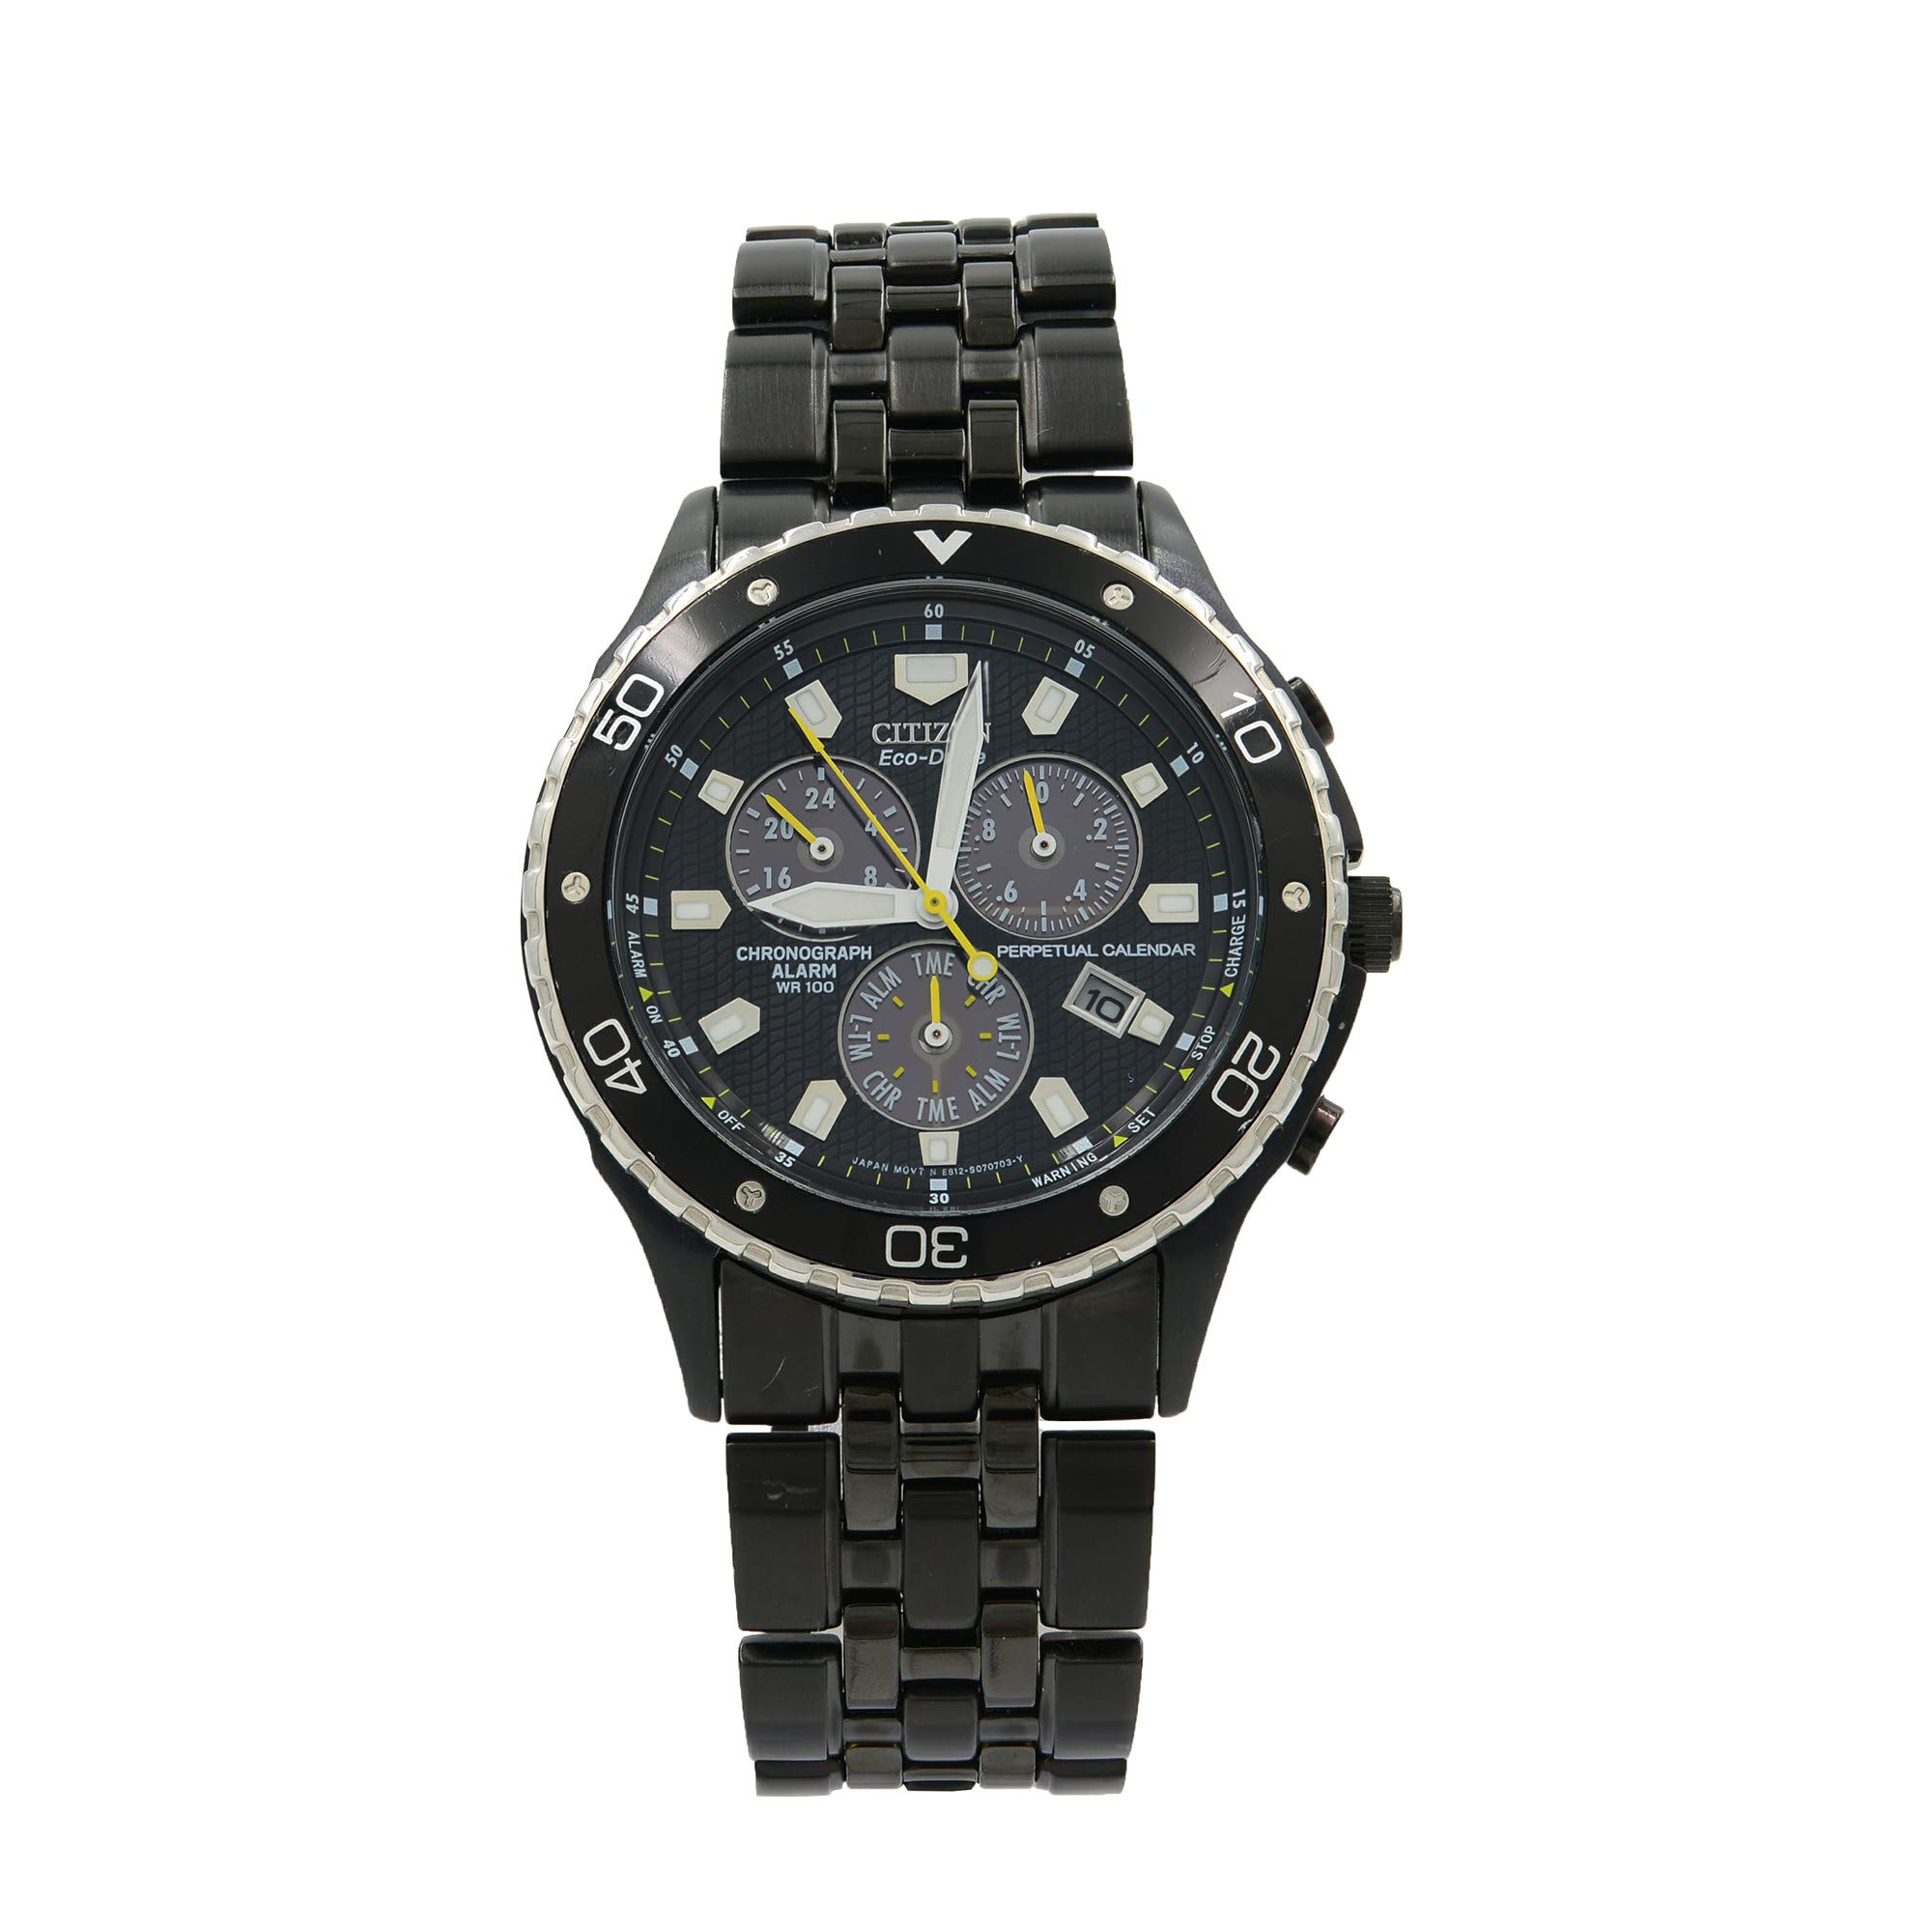 Citizen Eco Drive Quartz Male Watch BL5295-55E (Certified Pre-Owned)